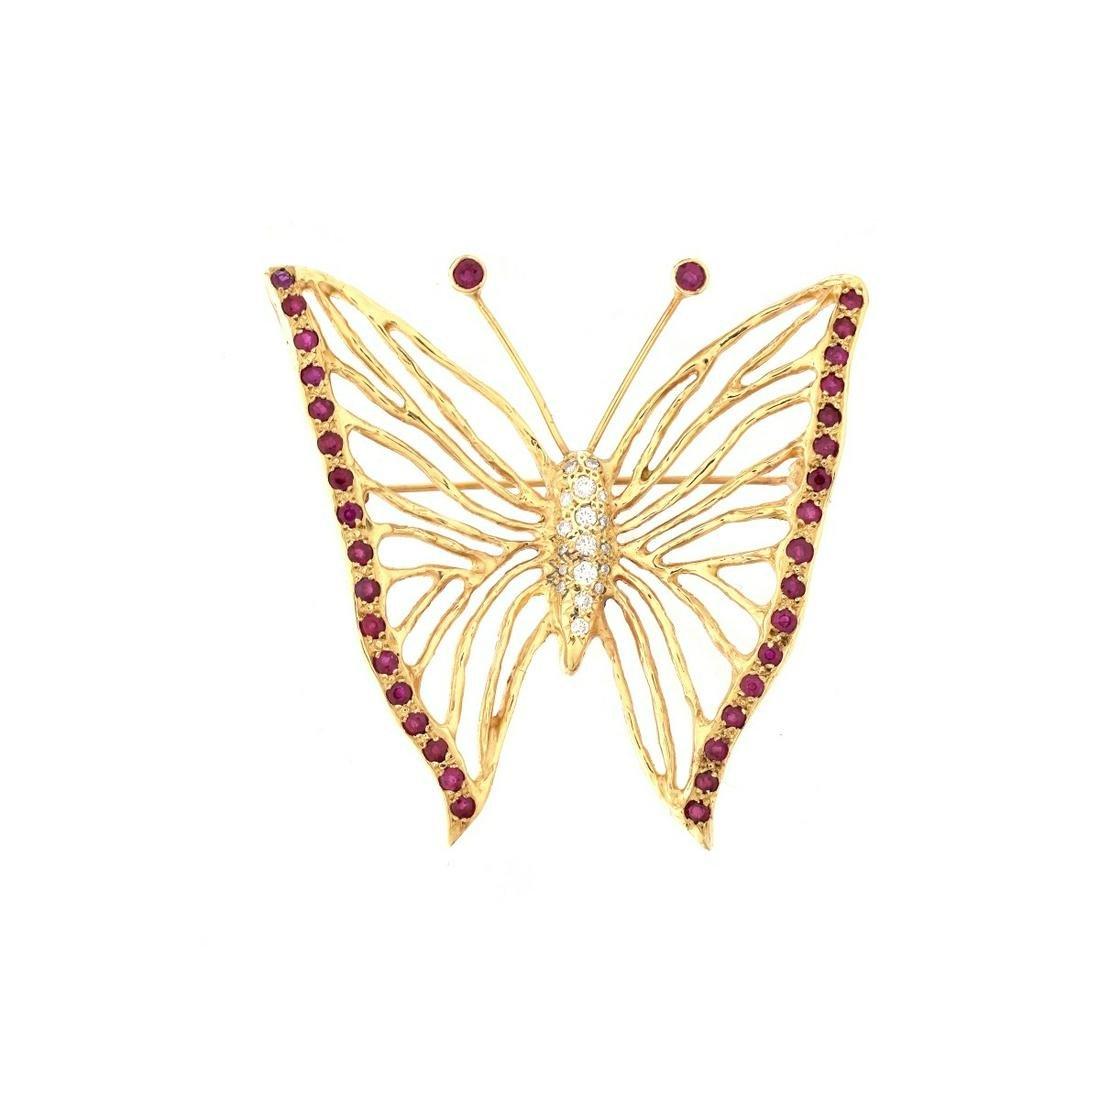 Vintage Ruby, Diamond and 14K Brooch